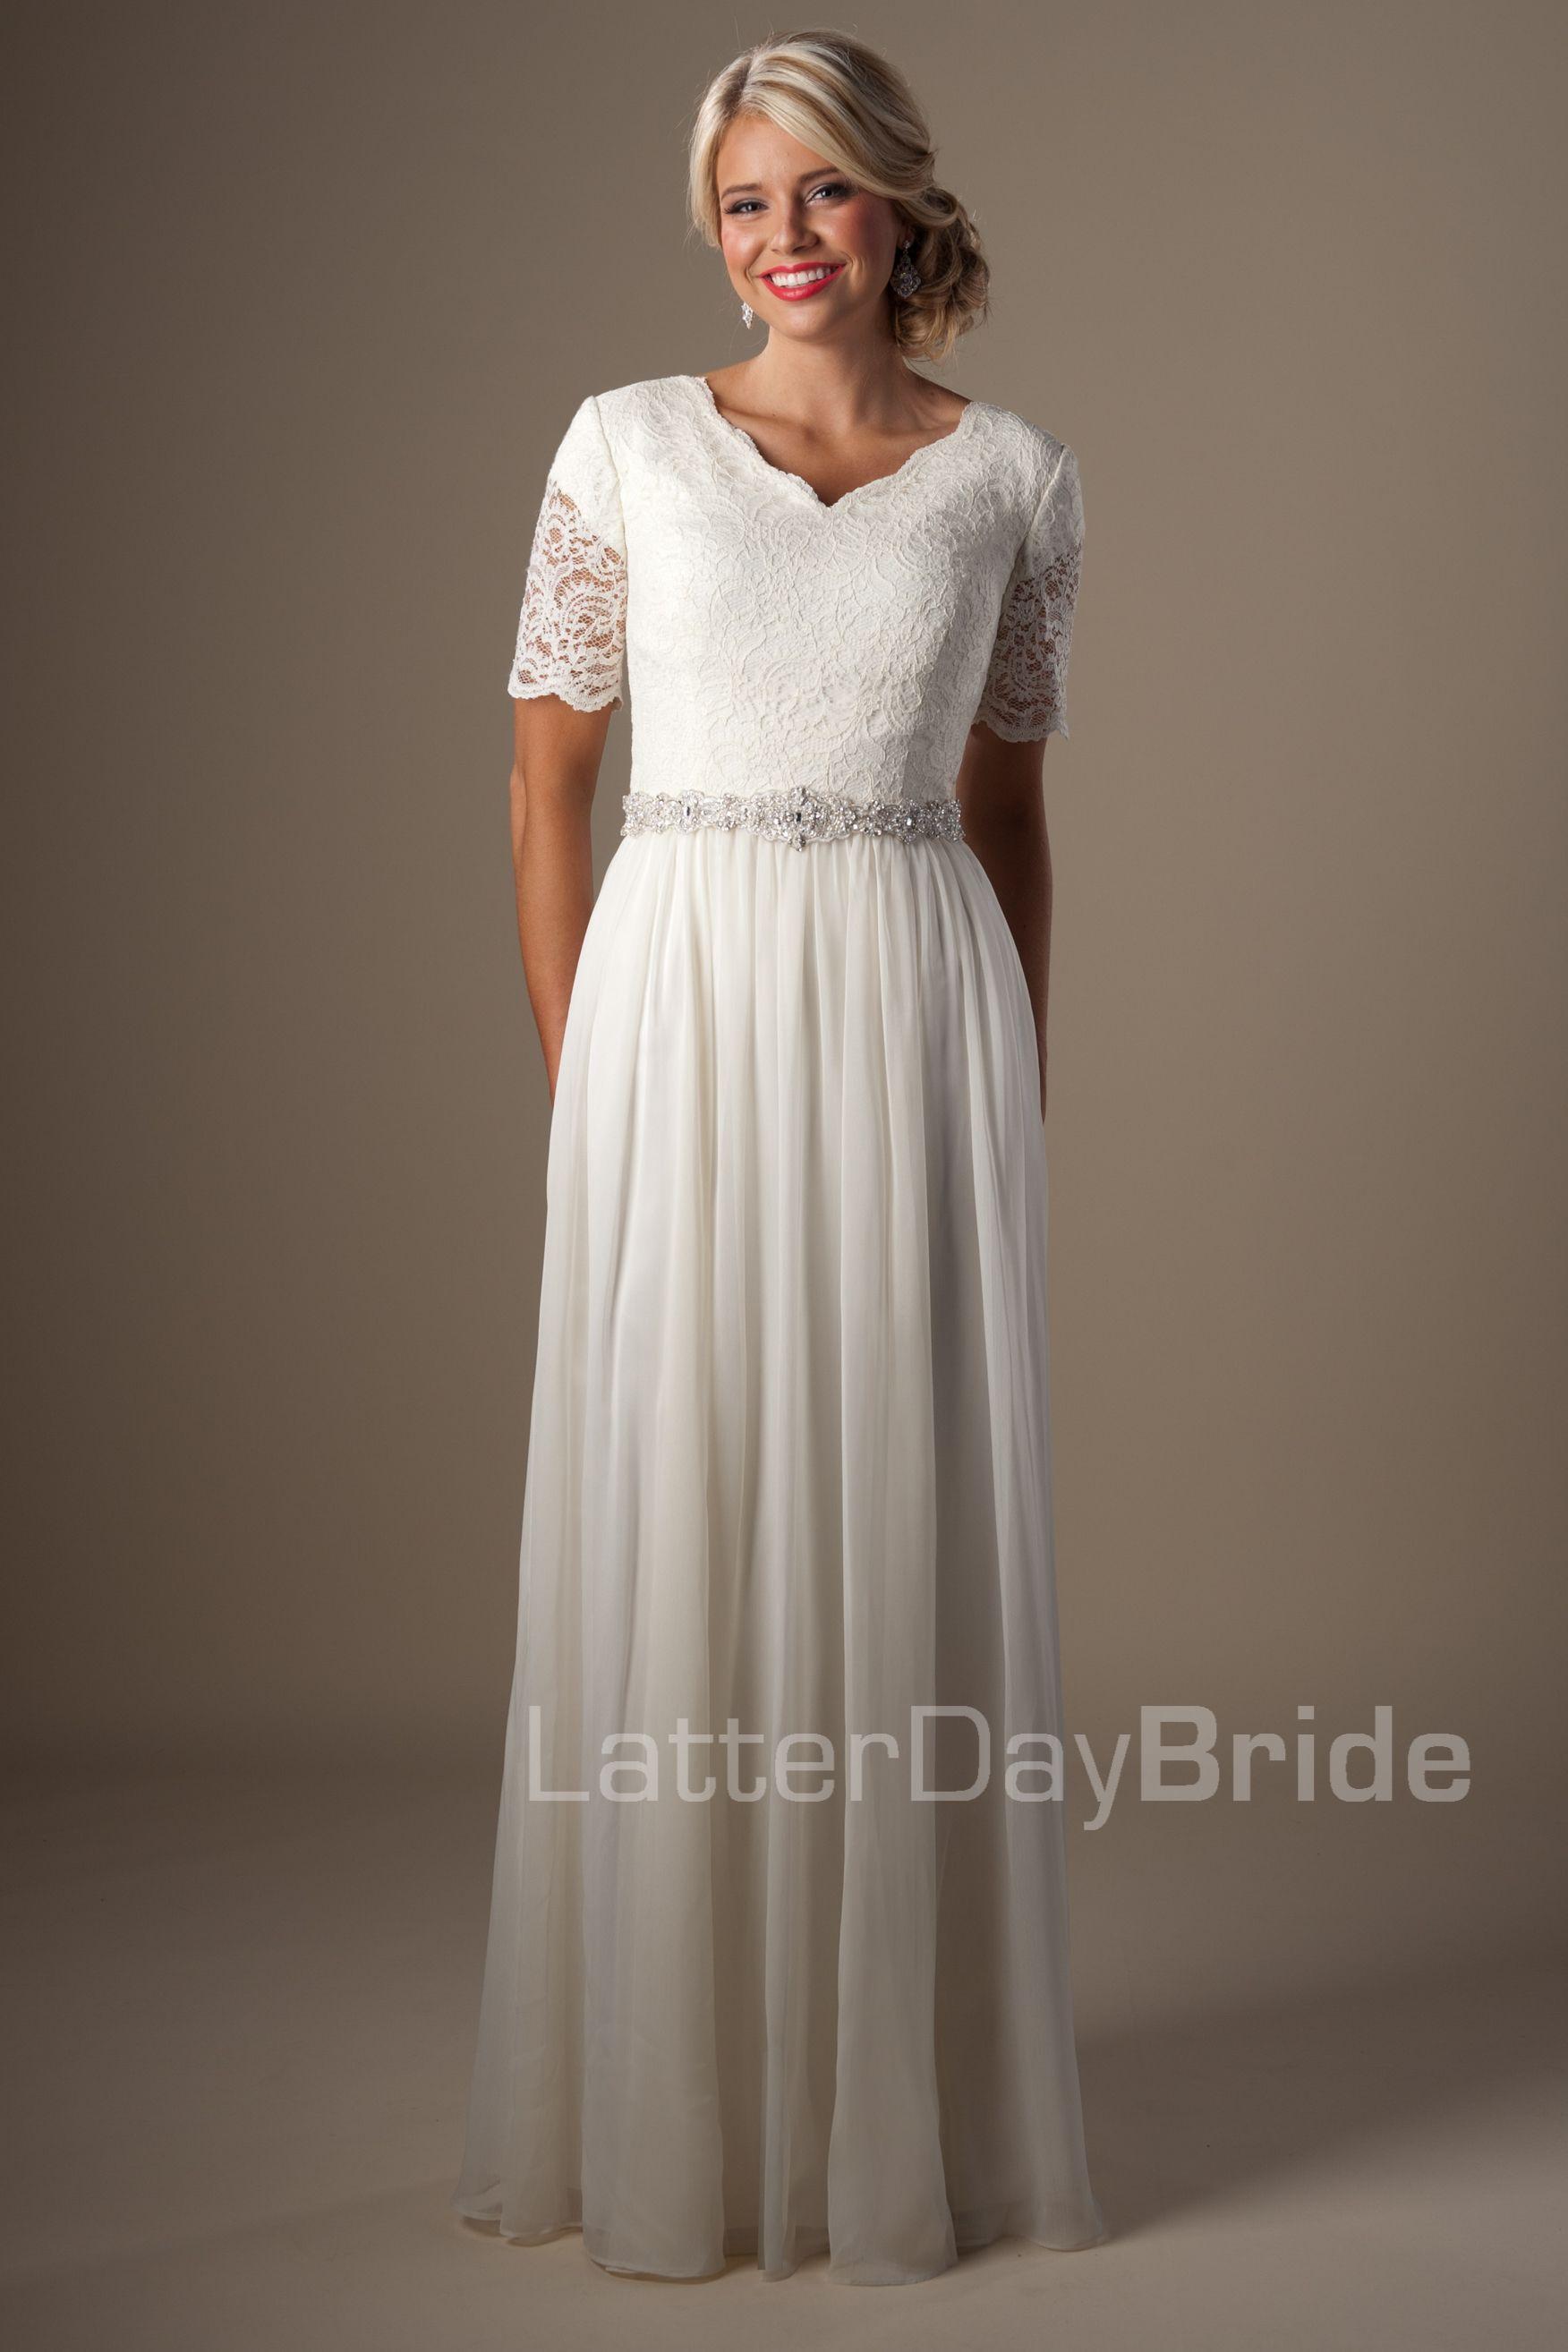 Modest Wedding Dresses : Leonora. Latter Day Bride, Gateway Bridal ...